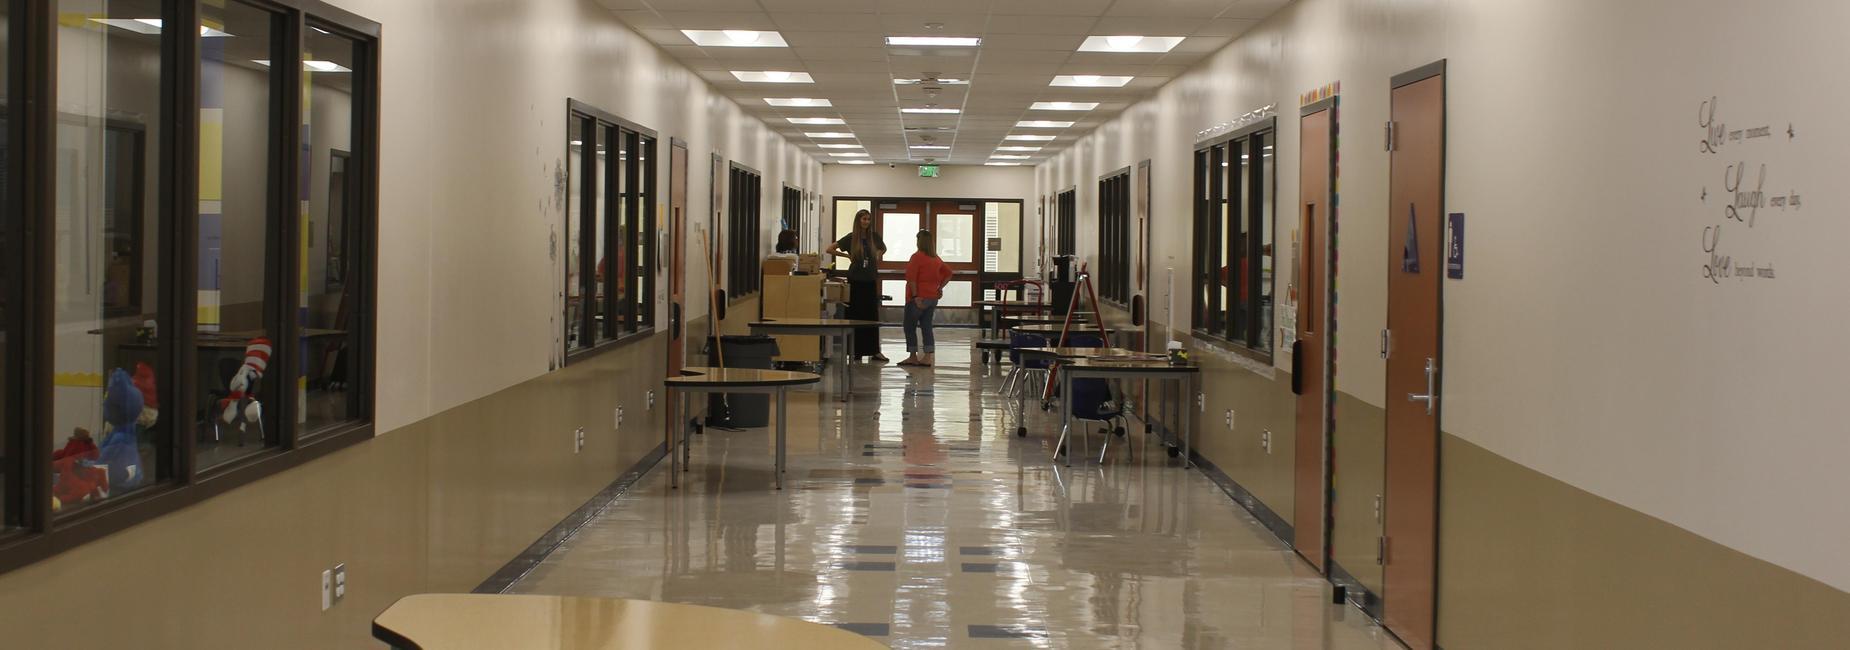 Hemet Elementary Hallway